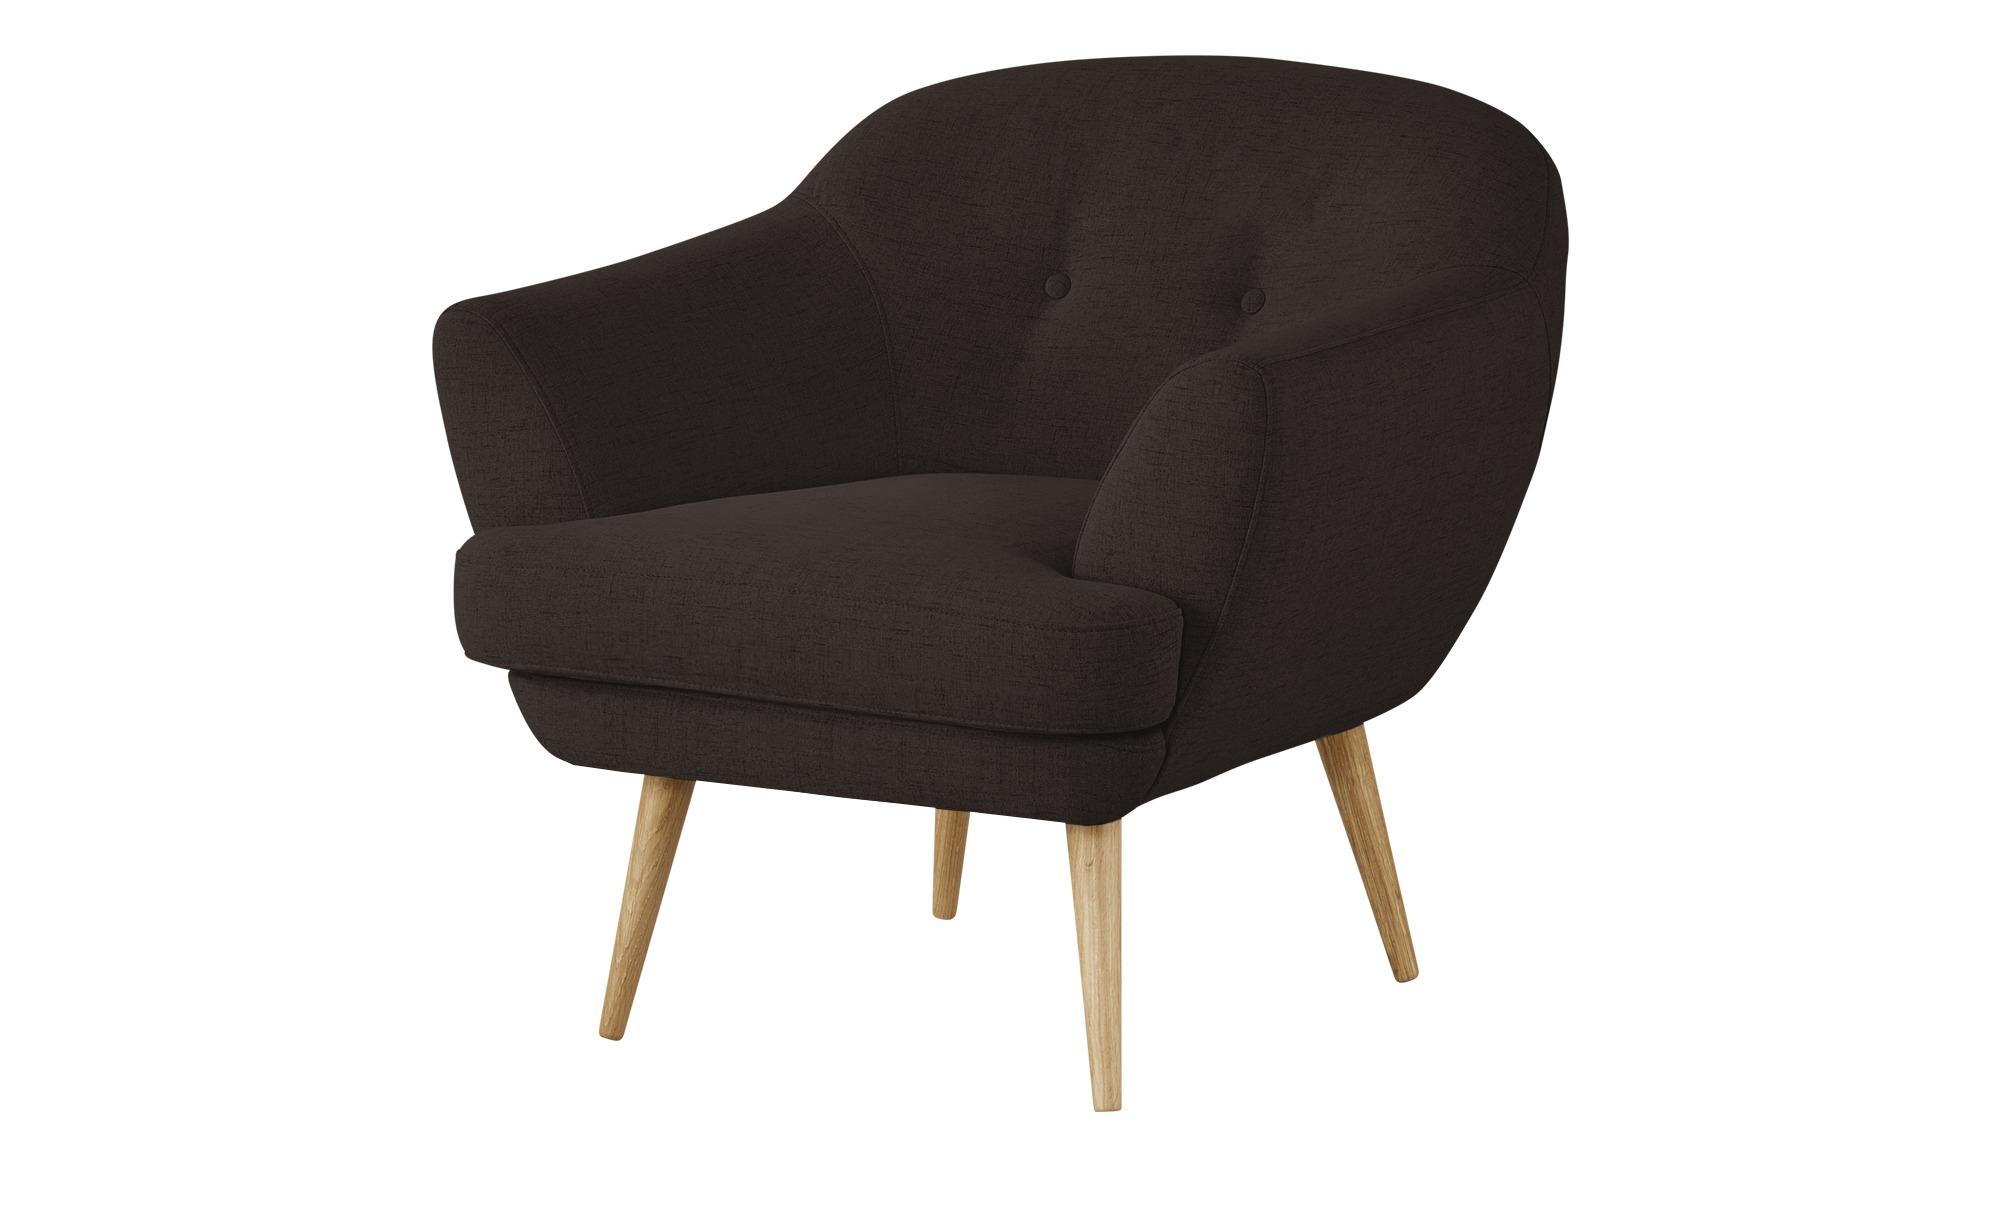 finya Sessel braun - Stoff Elara ¦ braun ¦ Maße (cm): B: 82 H: 80 T: 84 Polstermöbel > Sessel > Polstersessel - Höffner